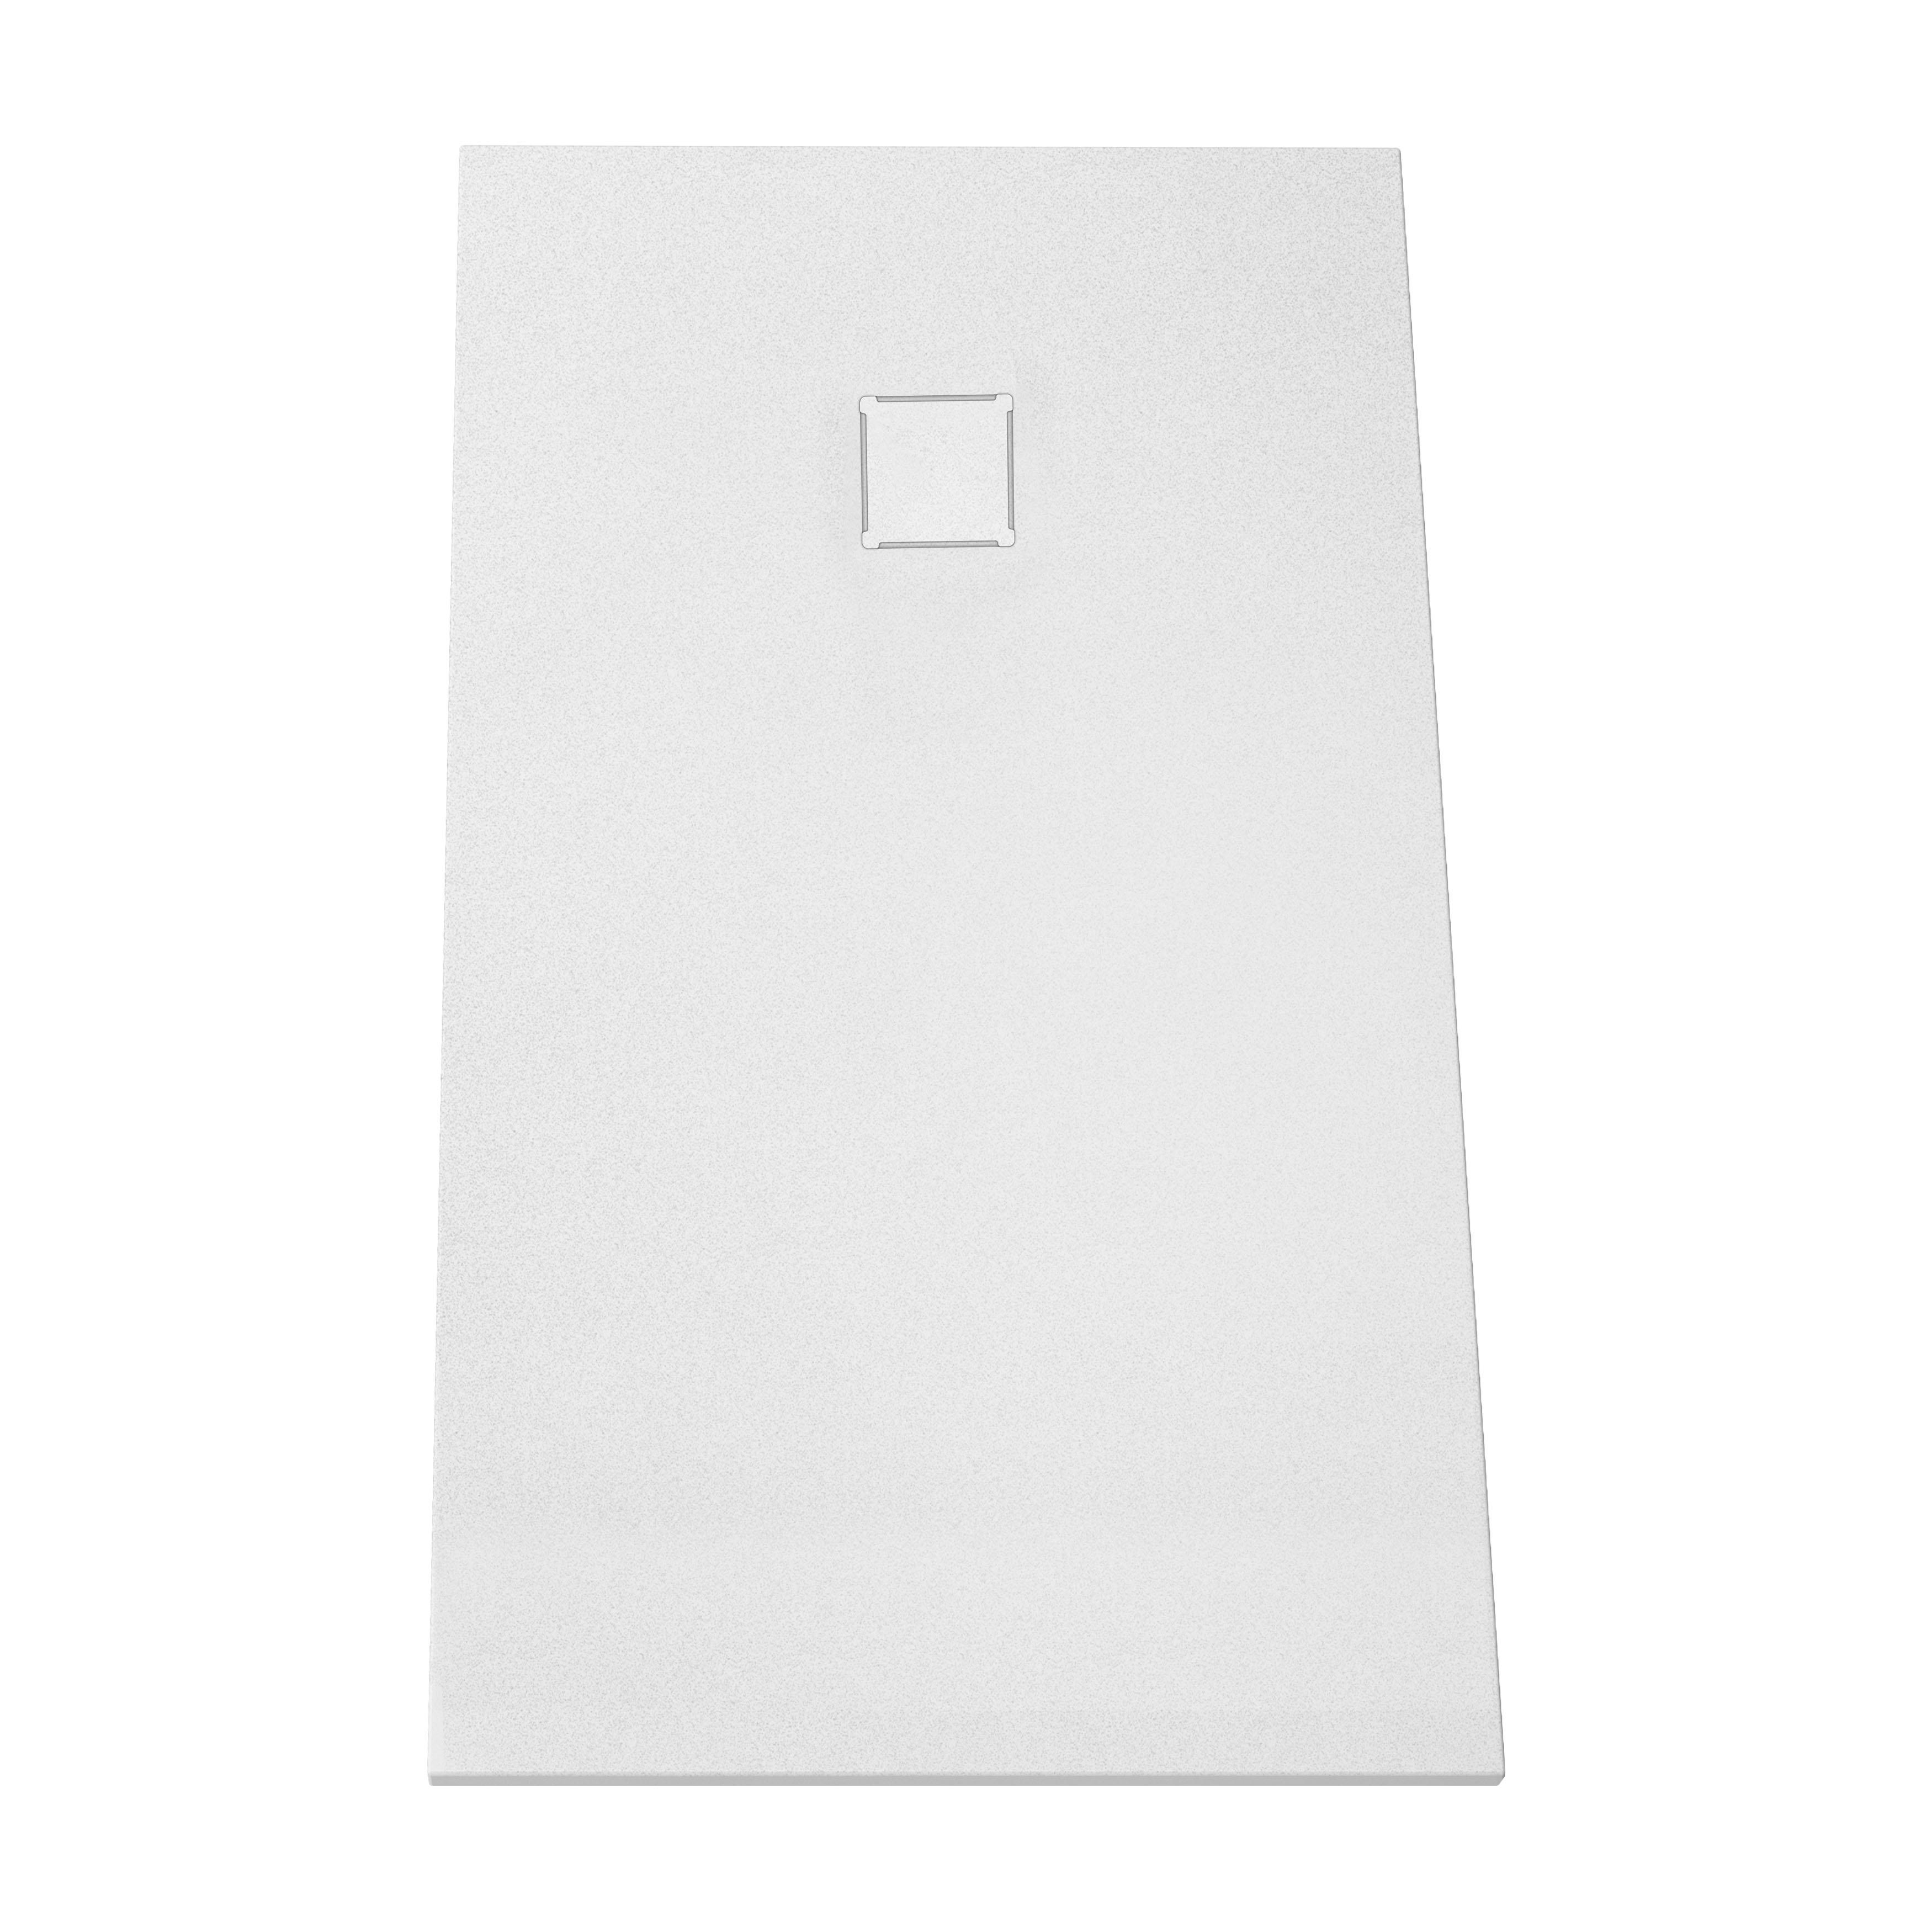 V-stone, receveur ultra plat en solid stone, 140  x  70 cm blanc